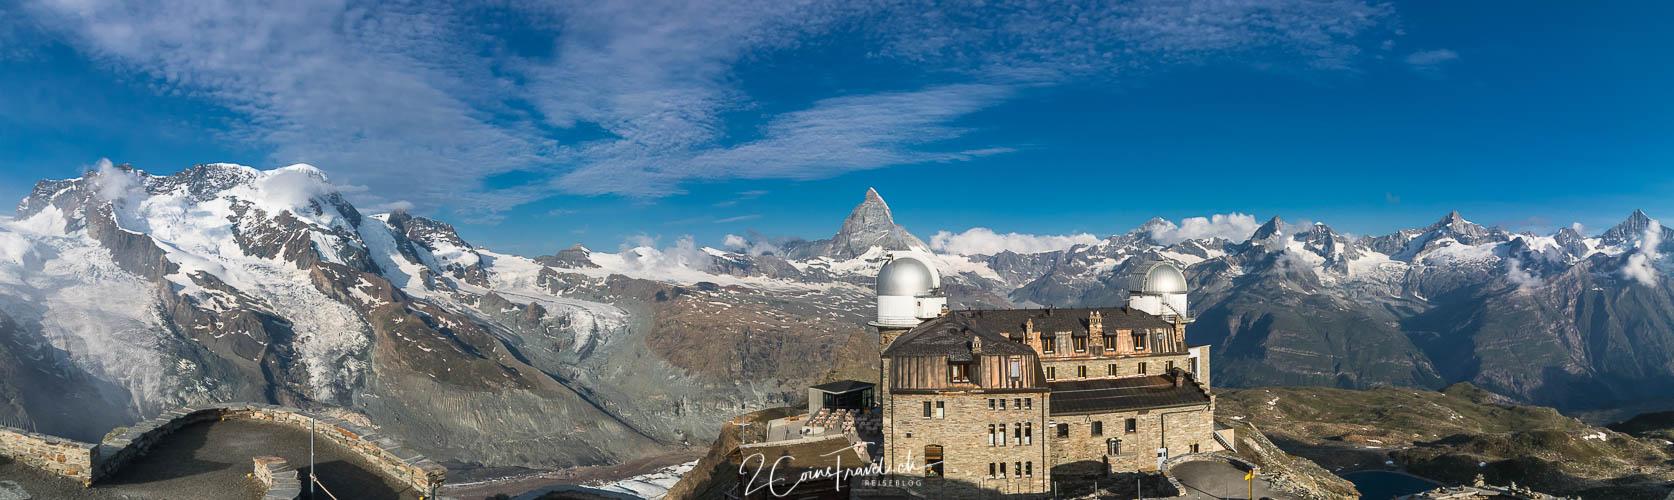 Gornergrat Matterhorn Panorama